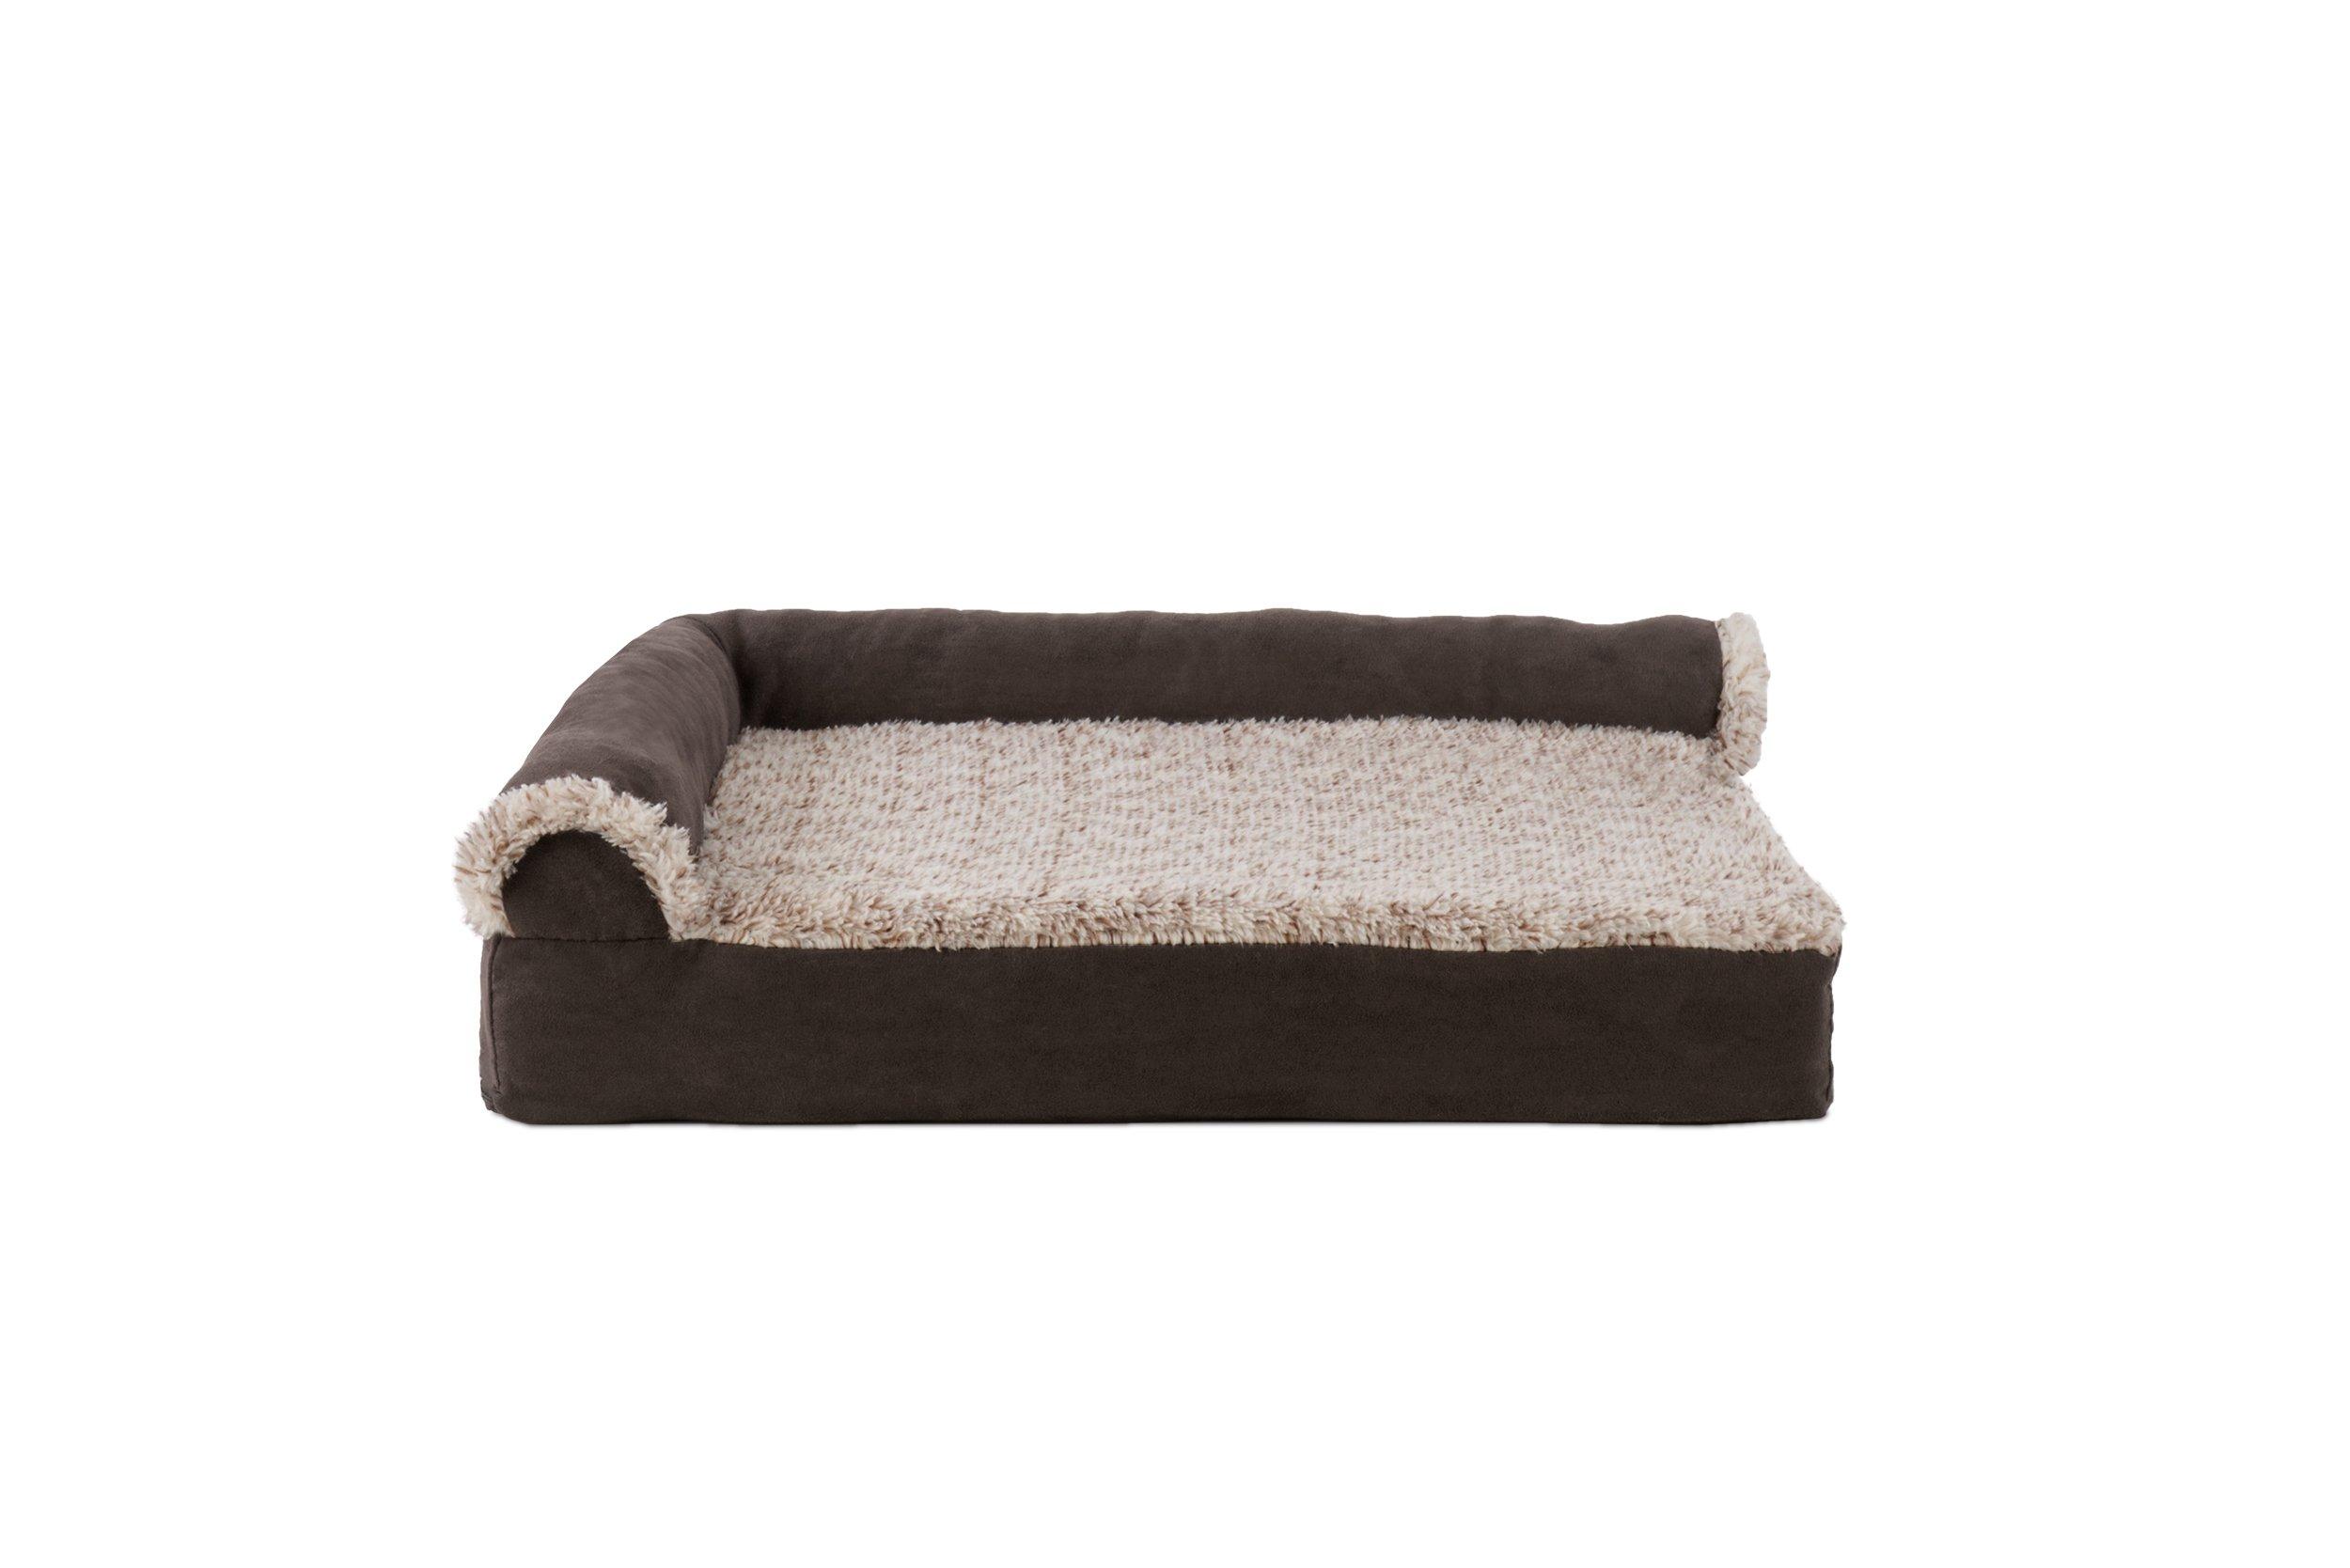 Furhaven Pet Deluxe Gel Foam Chaise Lounge Sofa Pet Bed, Small, Espresso